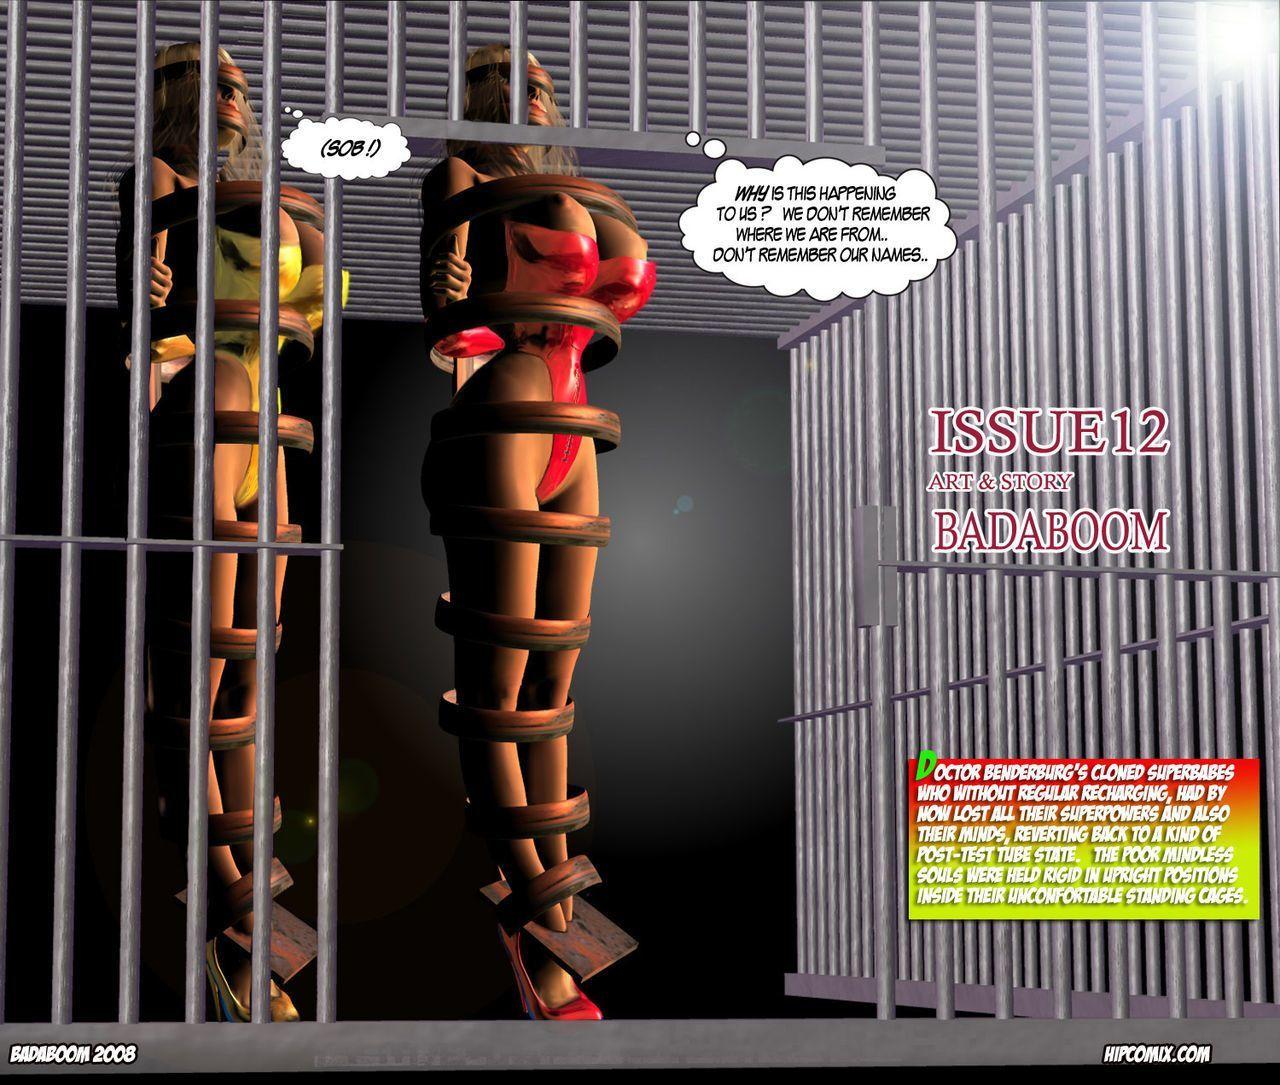 Badaboom Allura 6 Issue 11 and 12 (English) - part 2